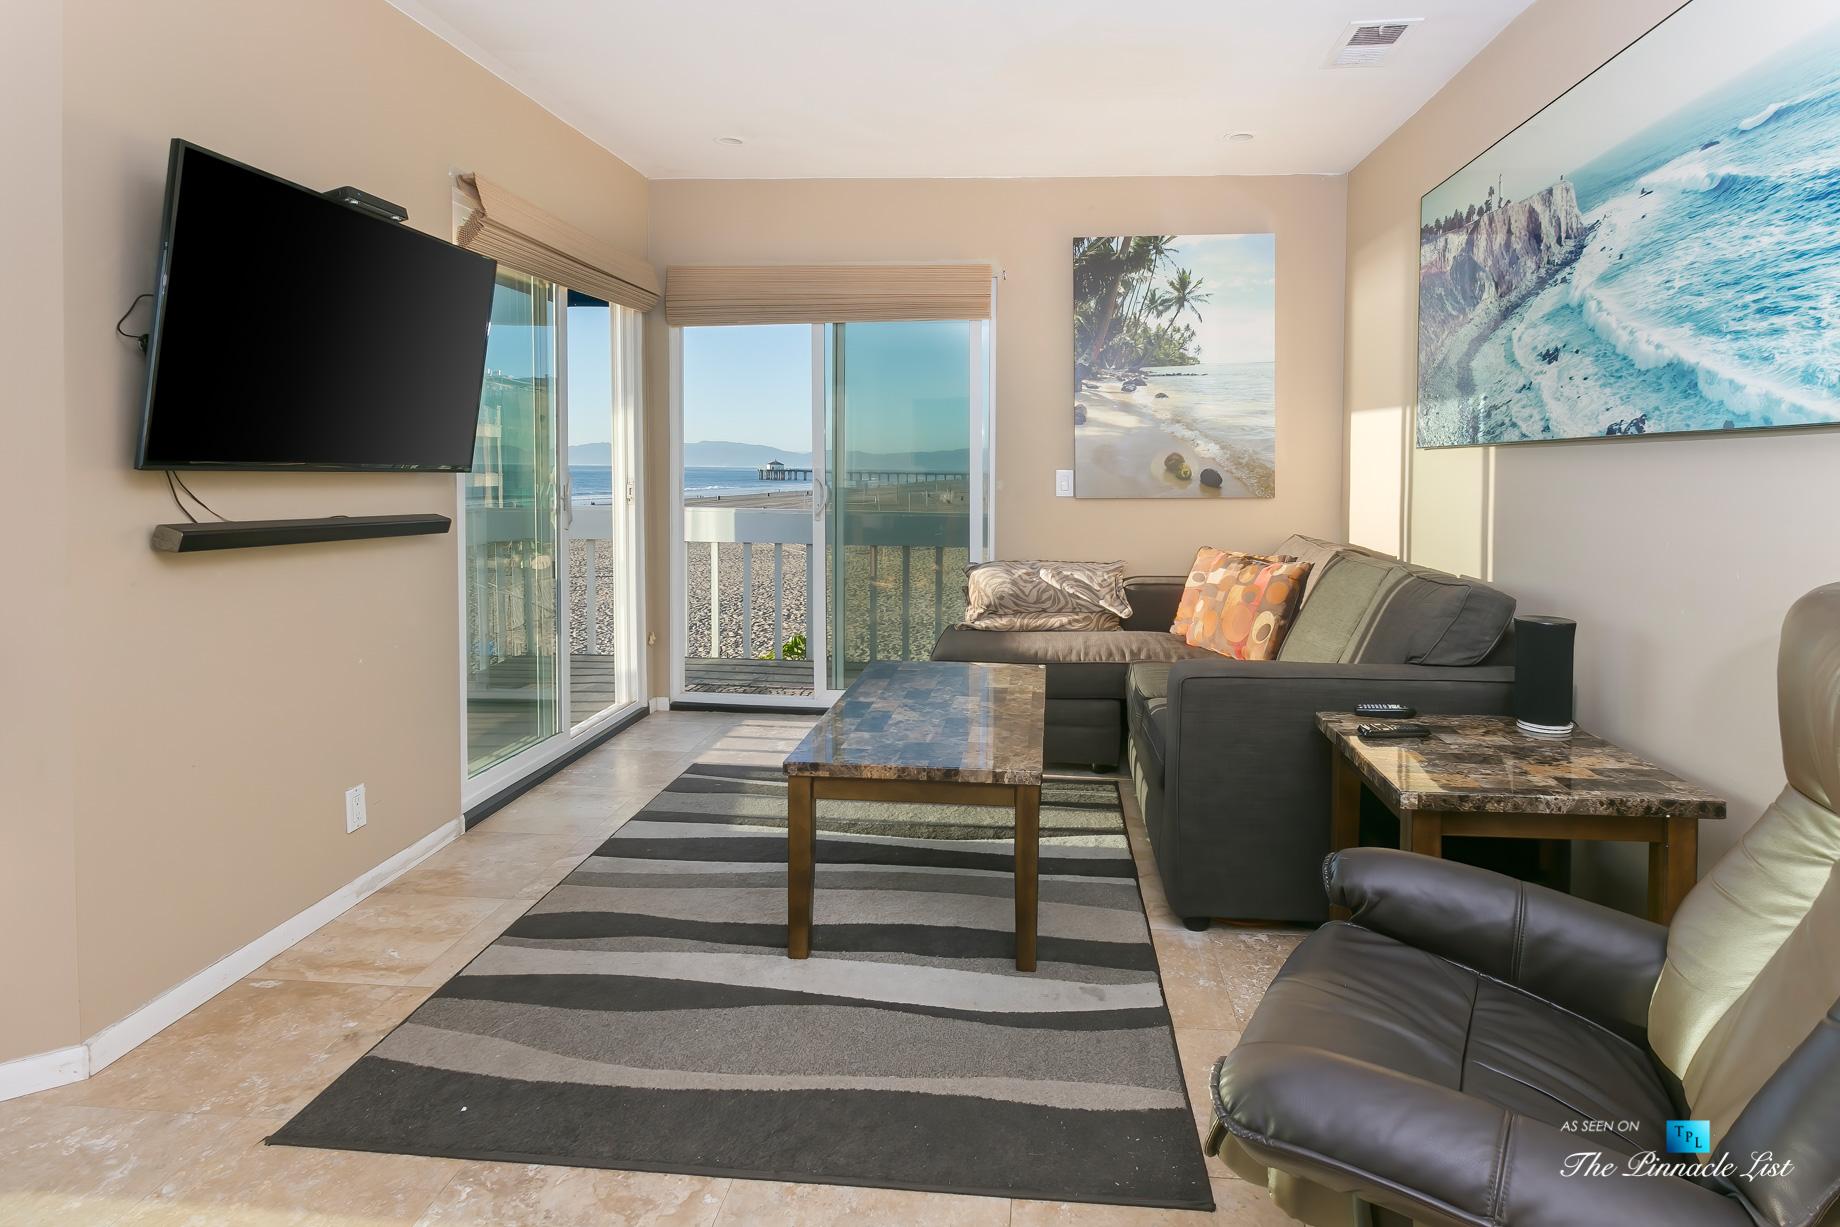 3500 The Strand, Hermosa Beach, CA, USA – Beachfront Living Room – Luxury Real Estate – Original 90210 Beach House – Oceanfront Home